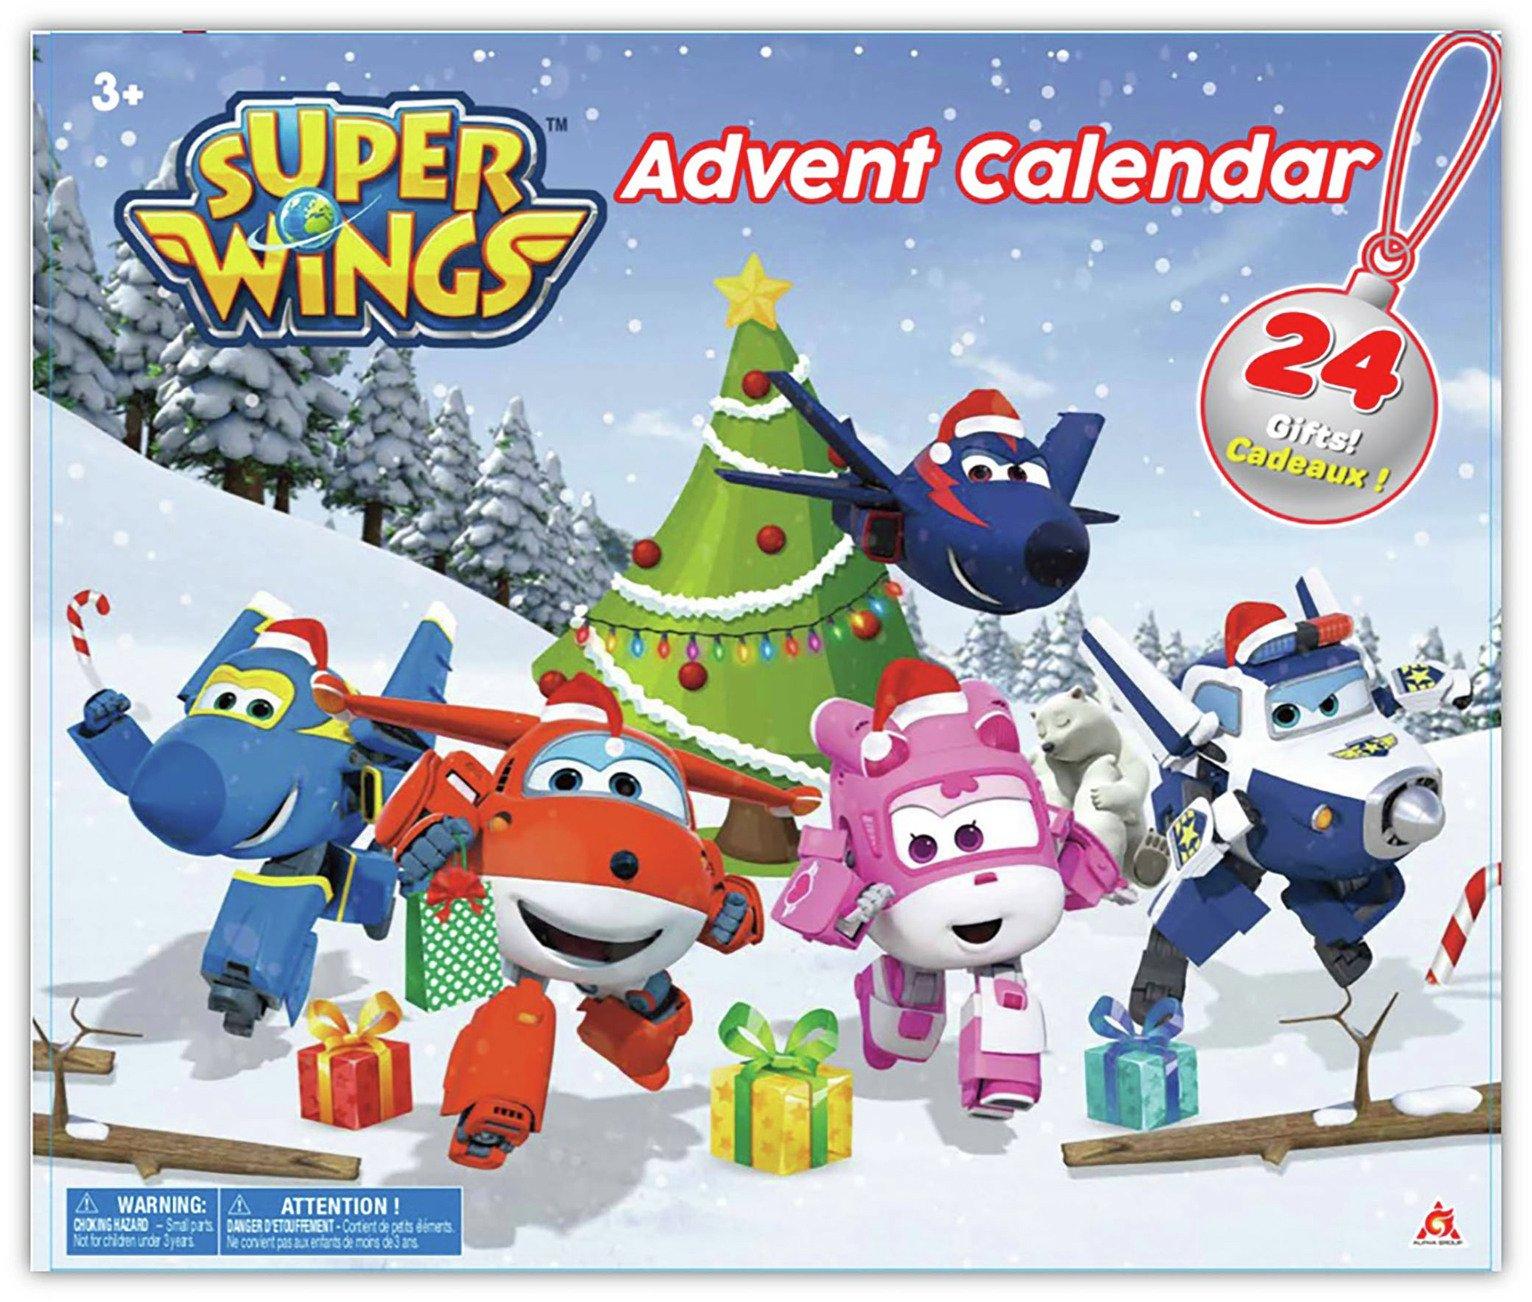 Super Wings Advent Calendar